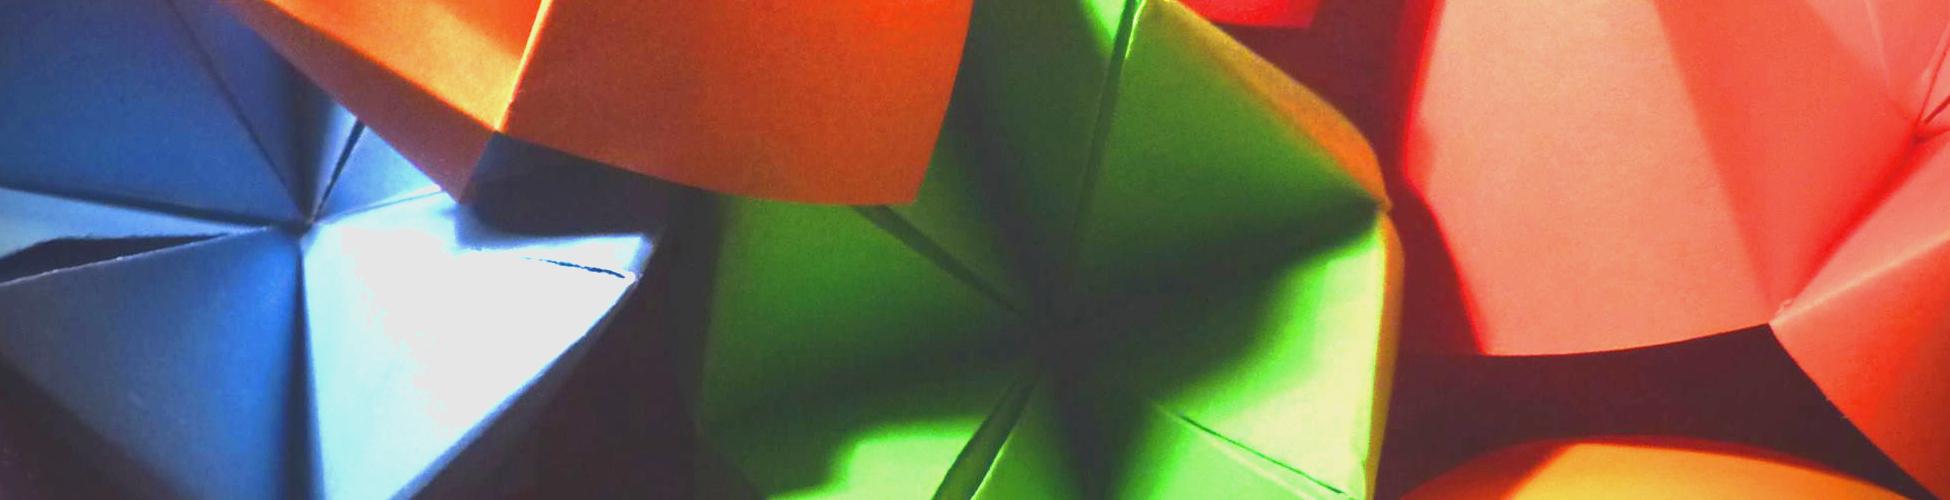 Cocotte Culturelle Brest - Origami presentation